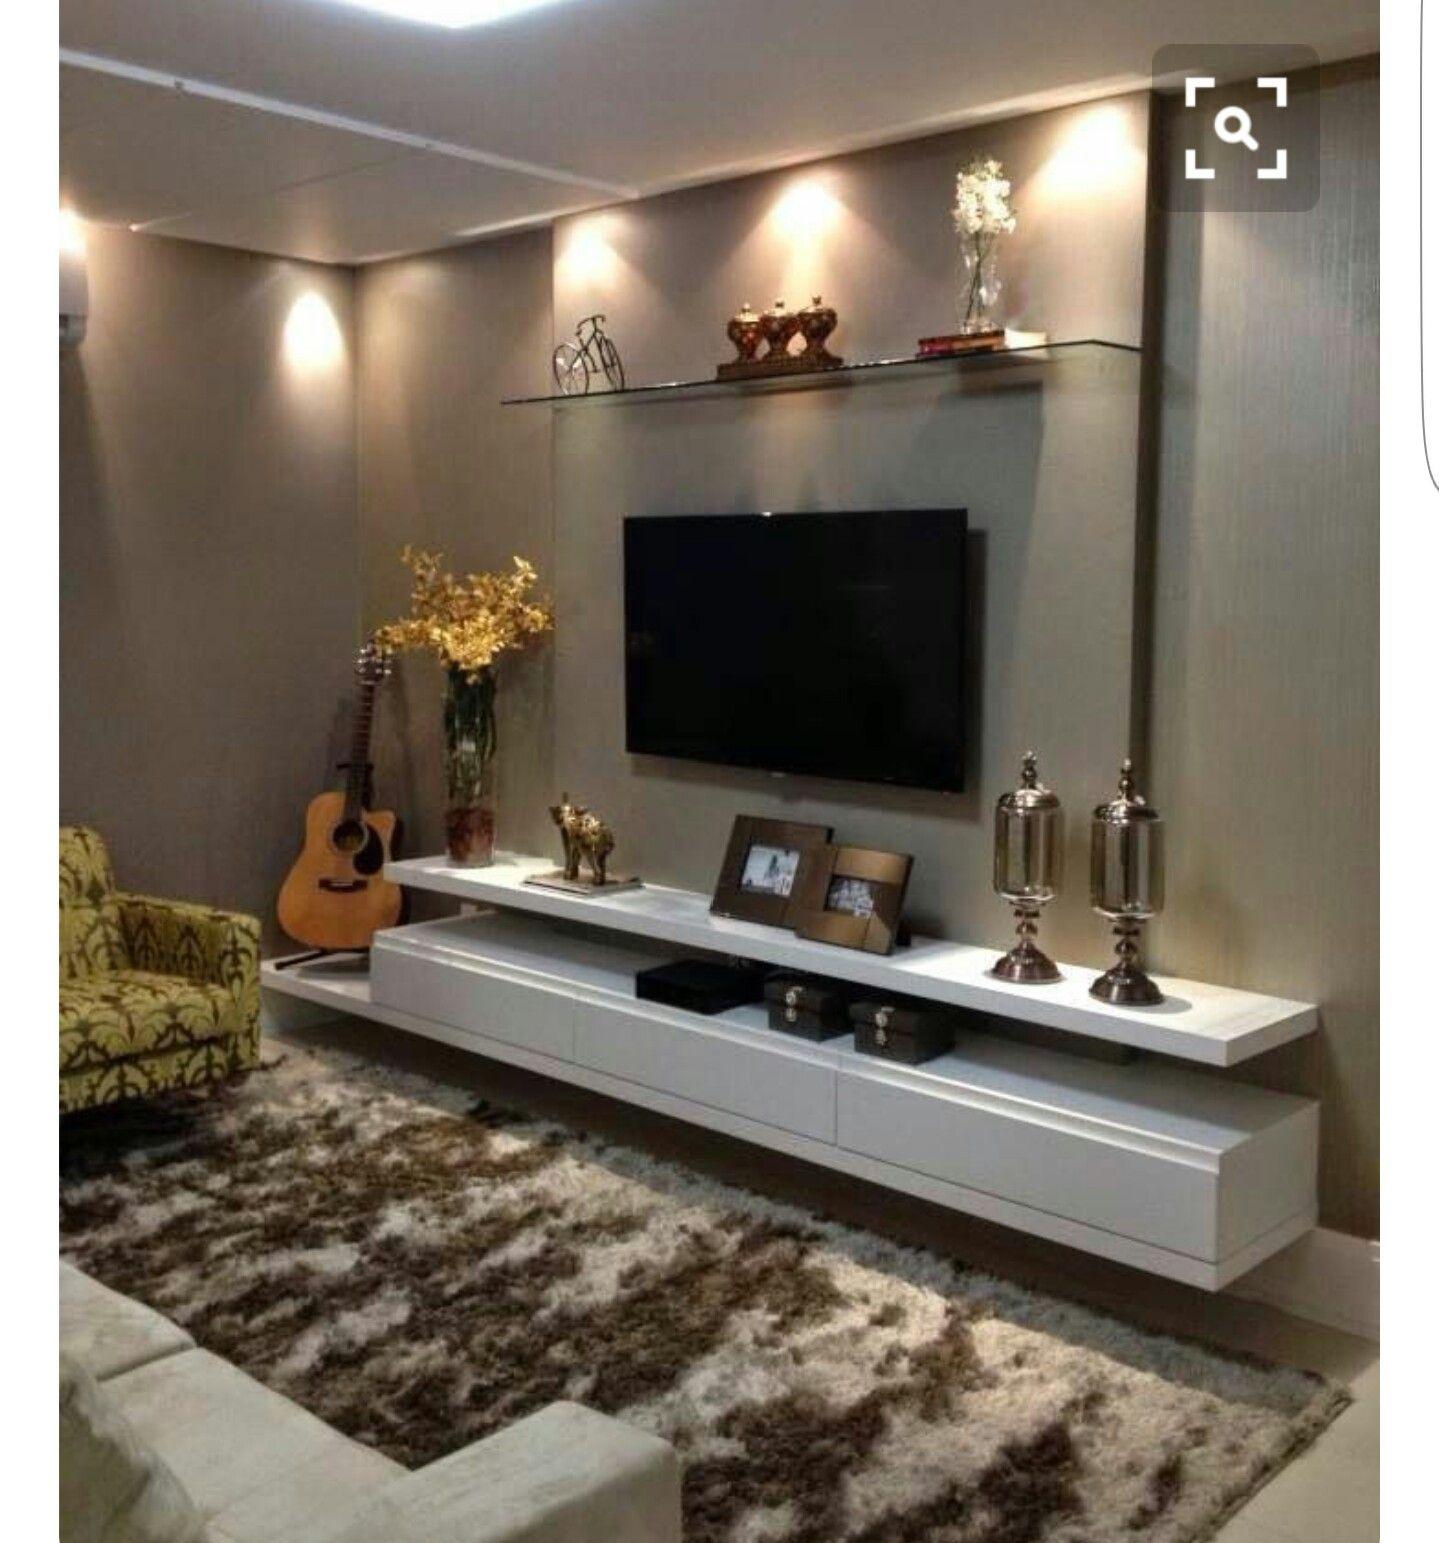 Pin de Nur Ceylan en tv stand home | Pinterest | Sala de estar ...